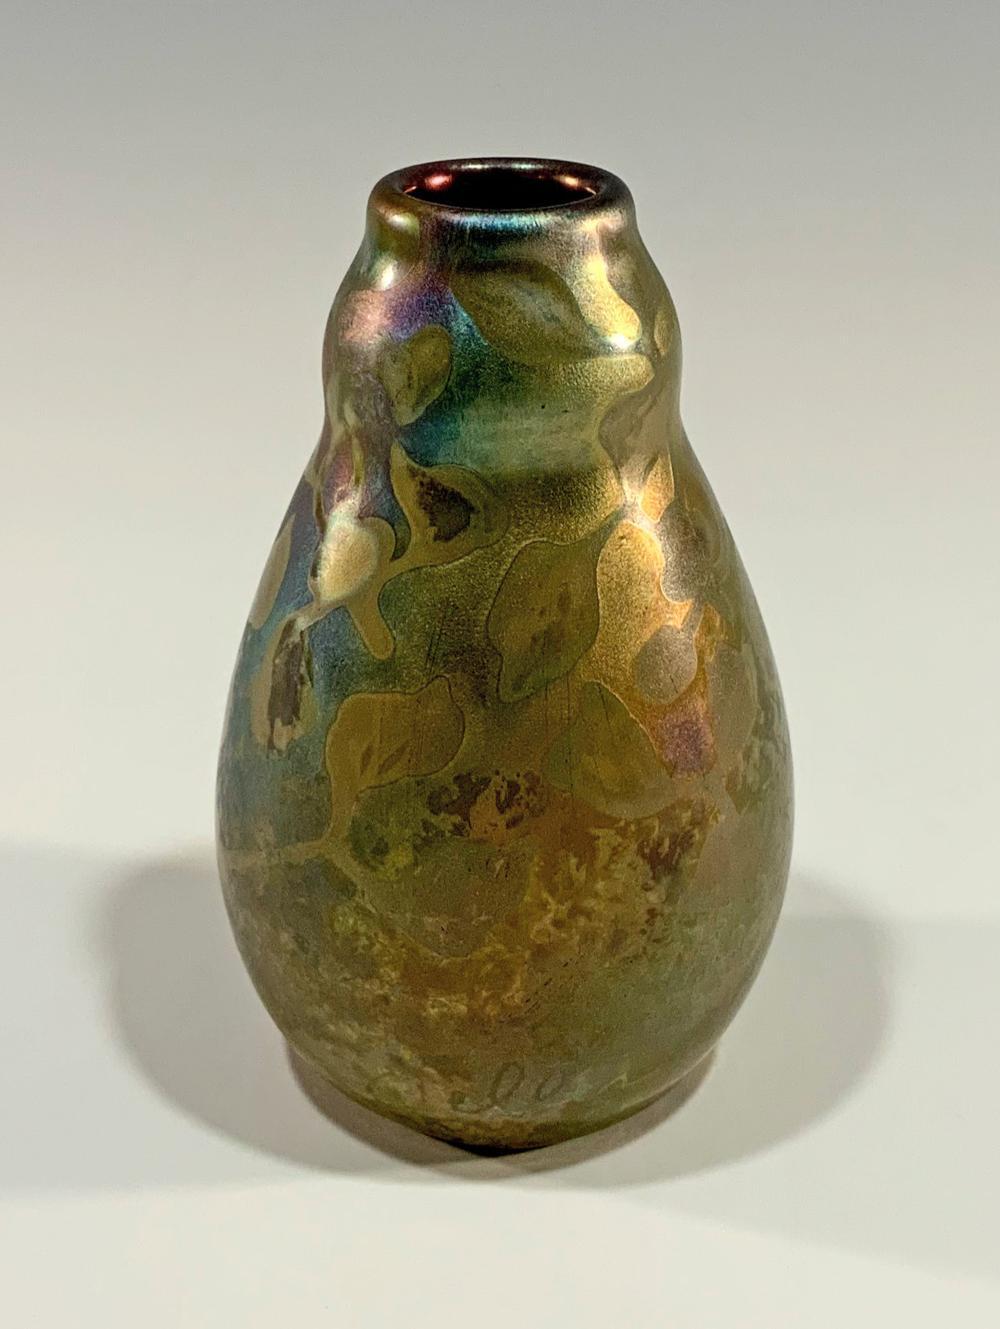 WELLER JACQUES SICARD ART POTTERY VASE C- 1905